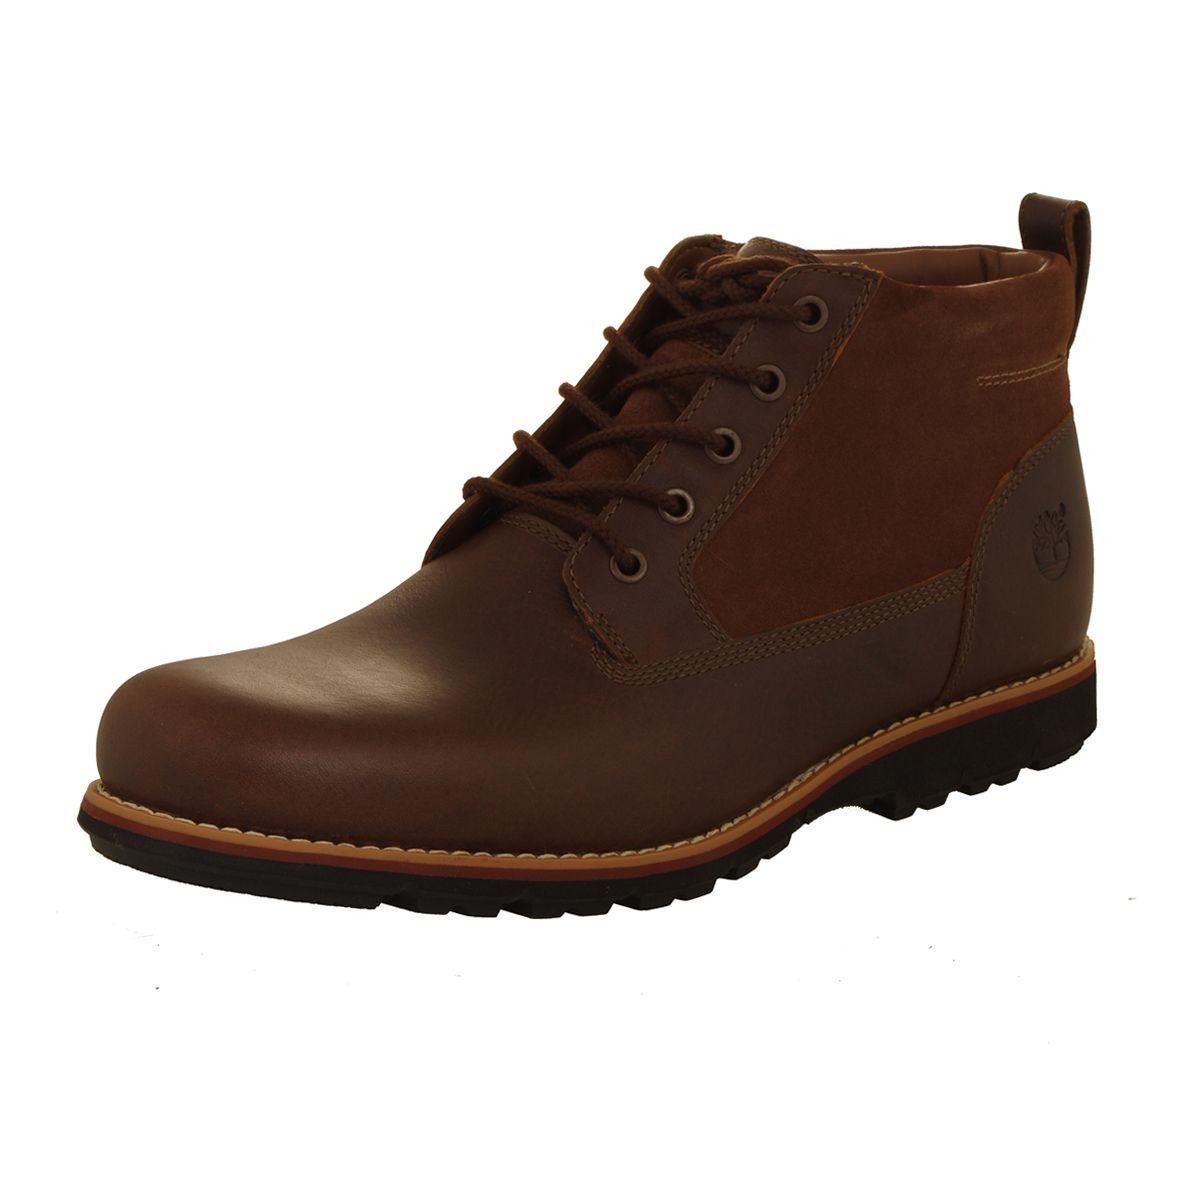 chaussures chukka marrons grande taille du 46 au 50. Black Bedroom Furniture Sets. Home Design Ideas